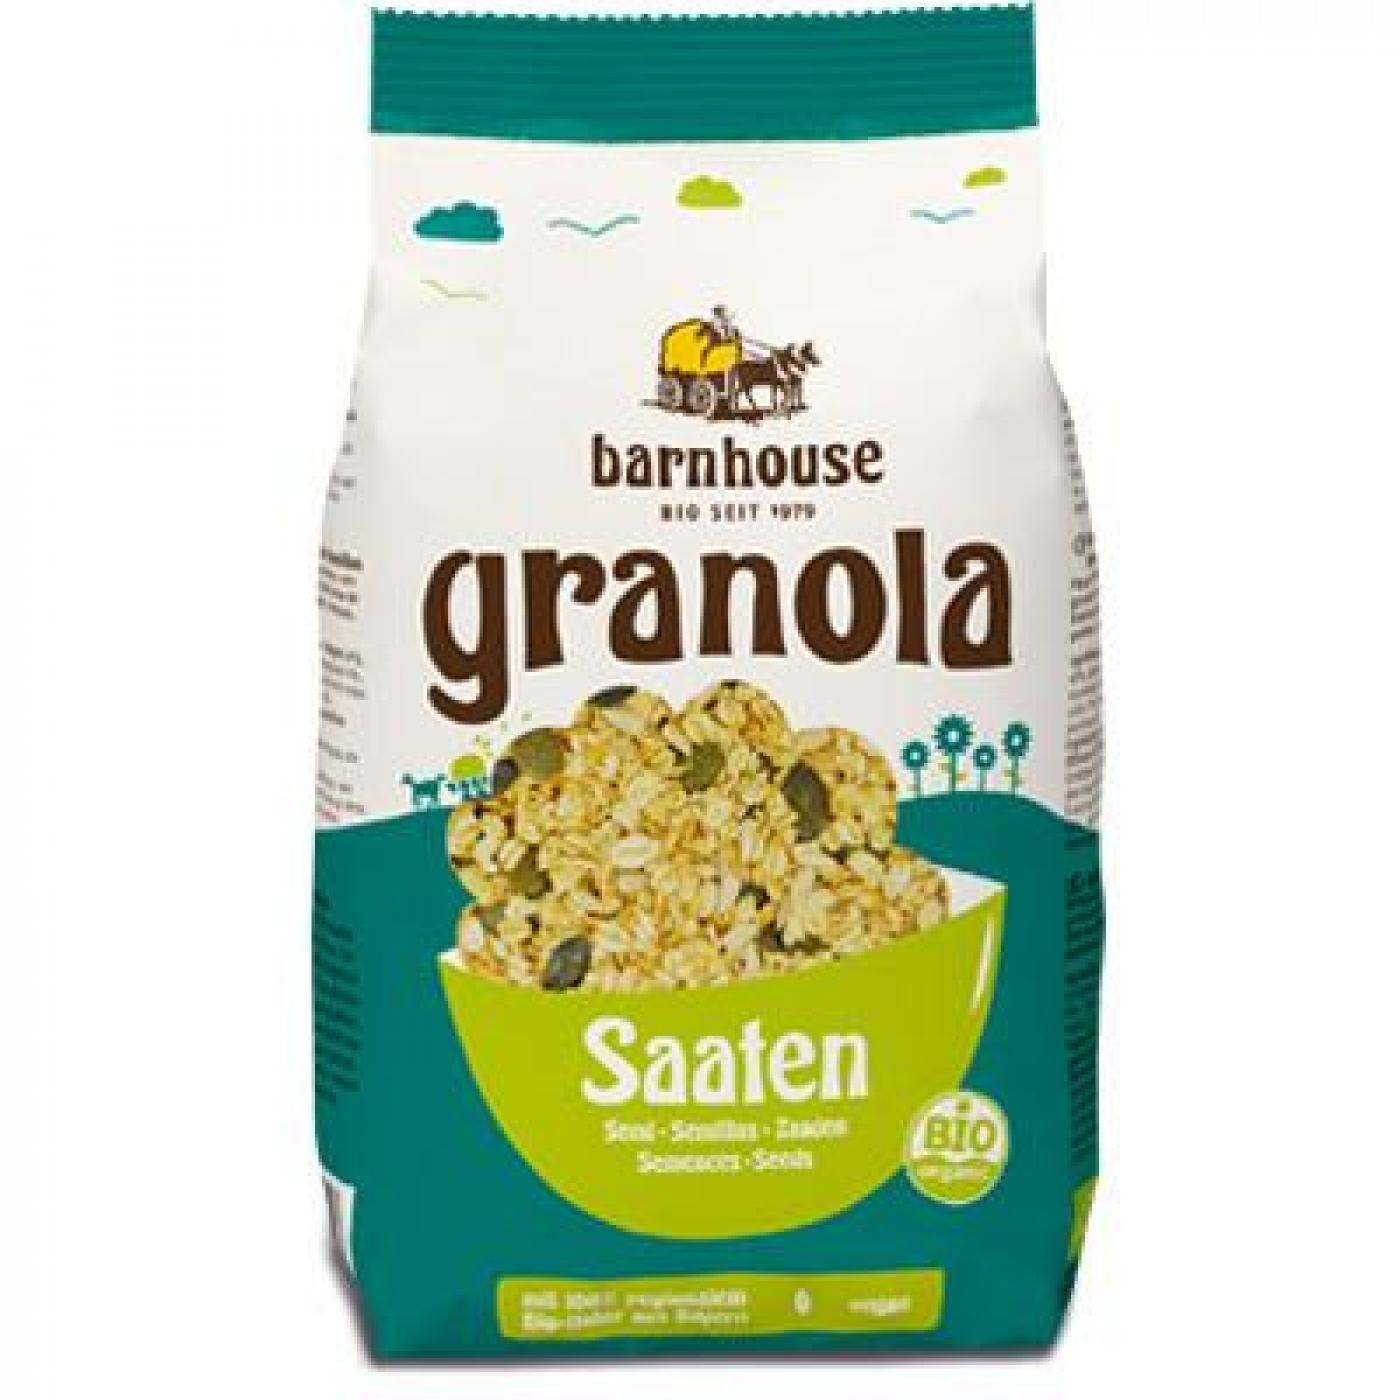 granola con semillas bio barnhouse 375 g por 8 40 en planeta huerto. Black Bedroom Furniture Sets. Home Design Ideas